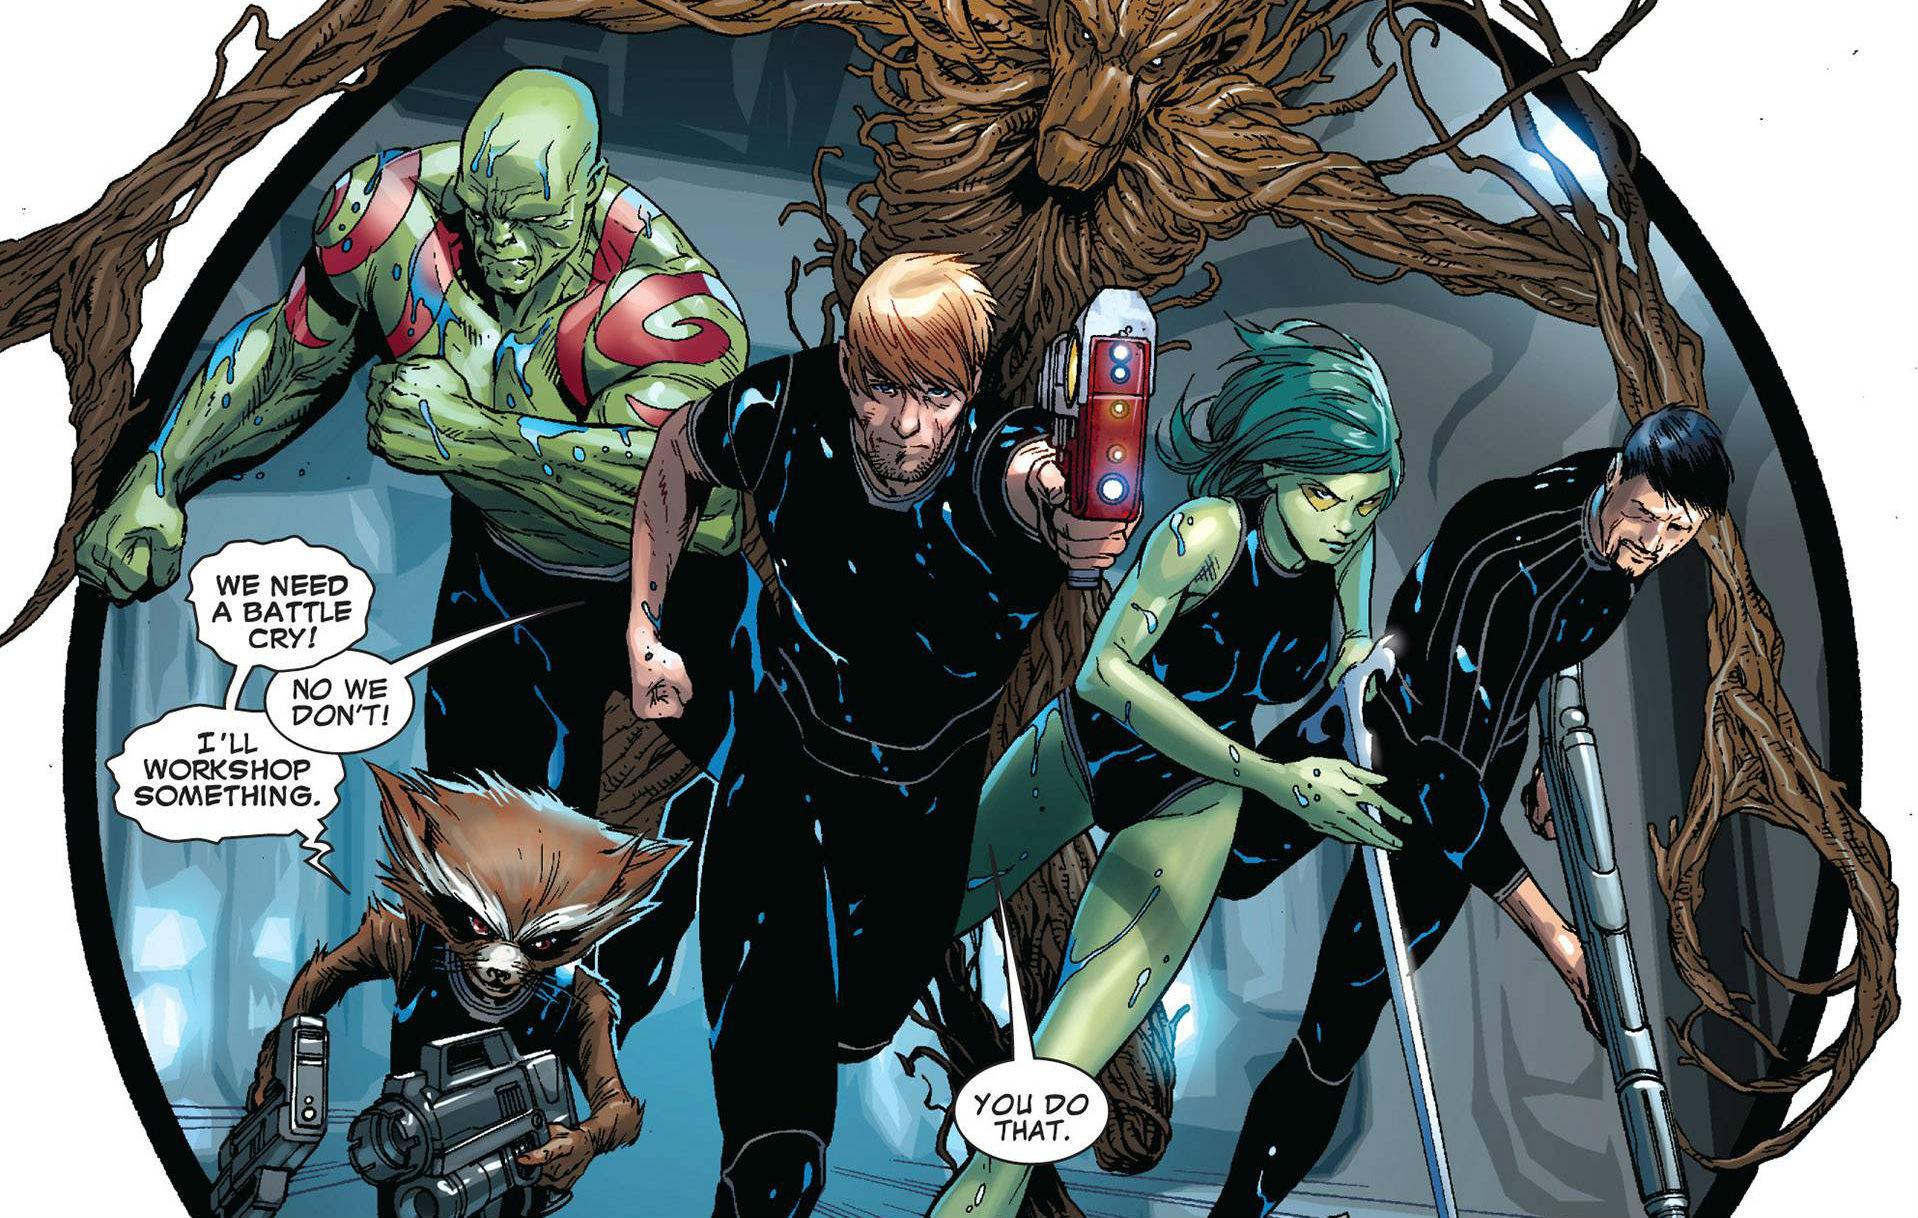 GUARDIANS OF THE GALAXY Marvel Superhero Jk Wallpaper